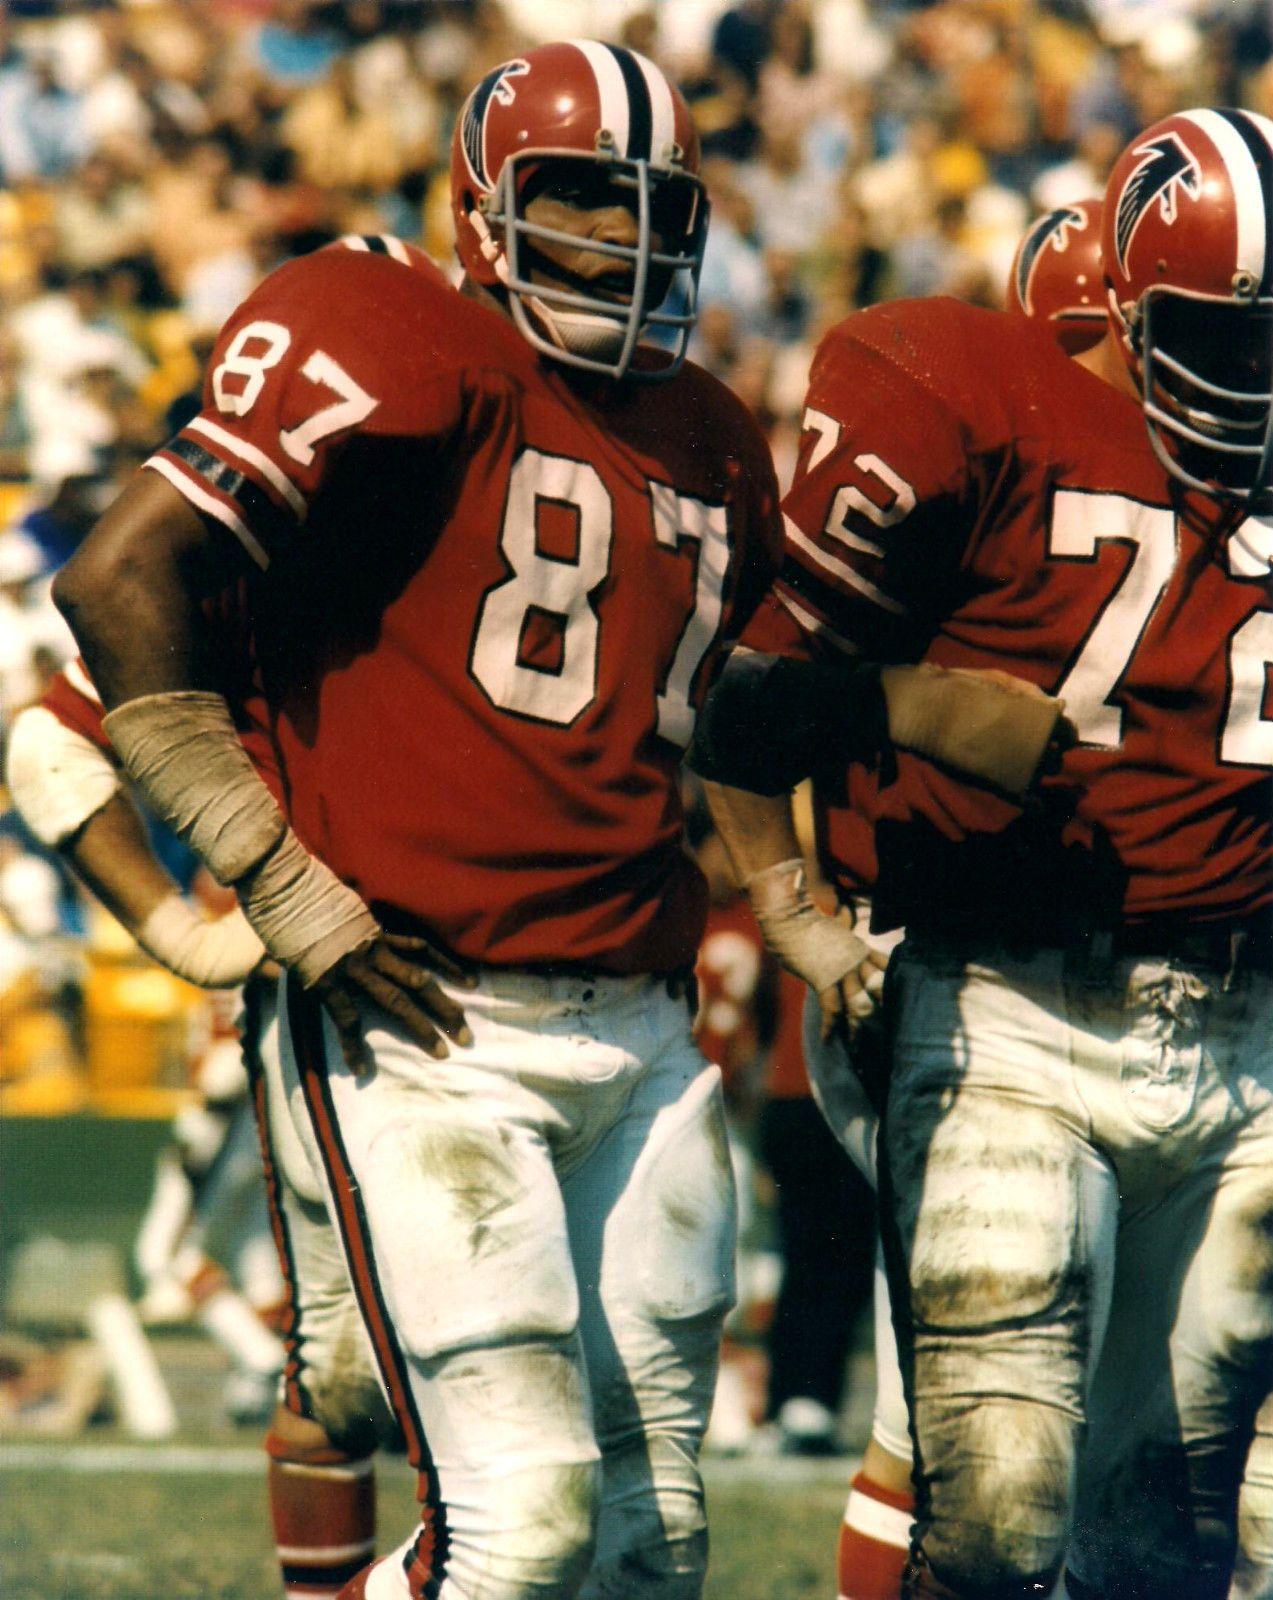 Claude Humphrey Atlanta Falcons 1968 78 And Philadelphia Eagles 1979 81 Hof Class 14 Football Players Photos Nfl Football Players Falcons Football